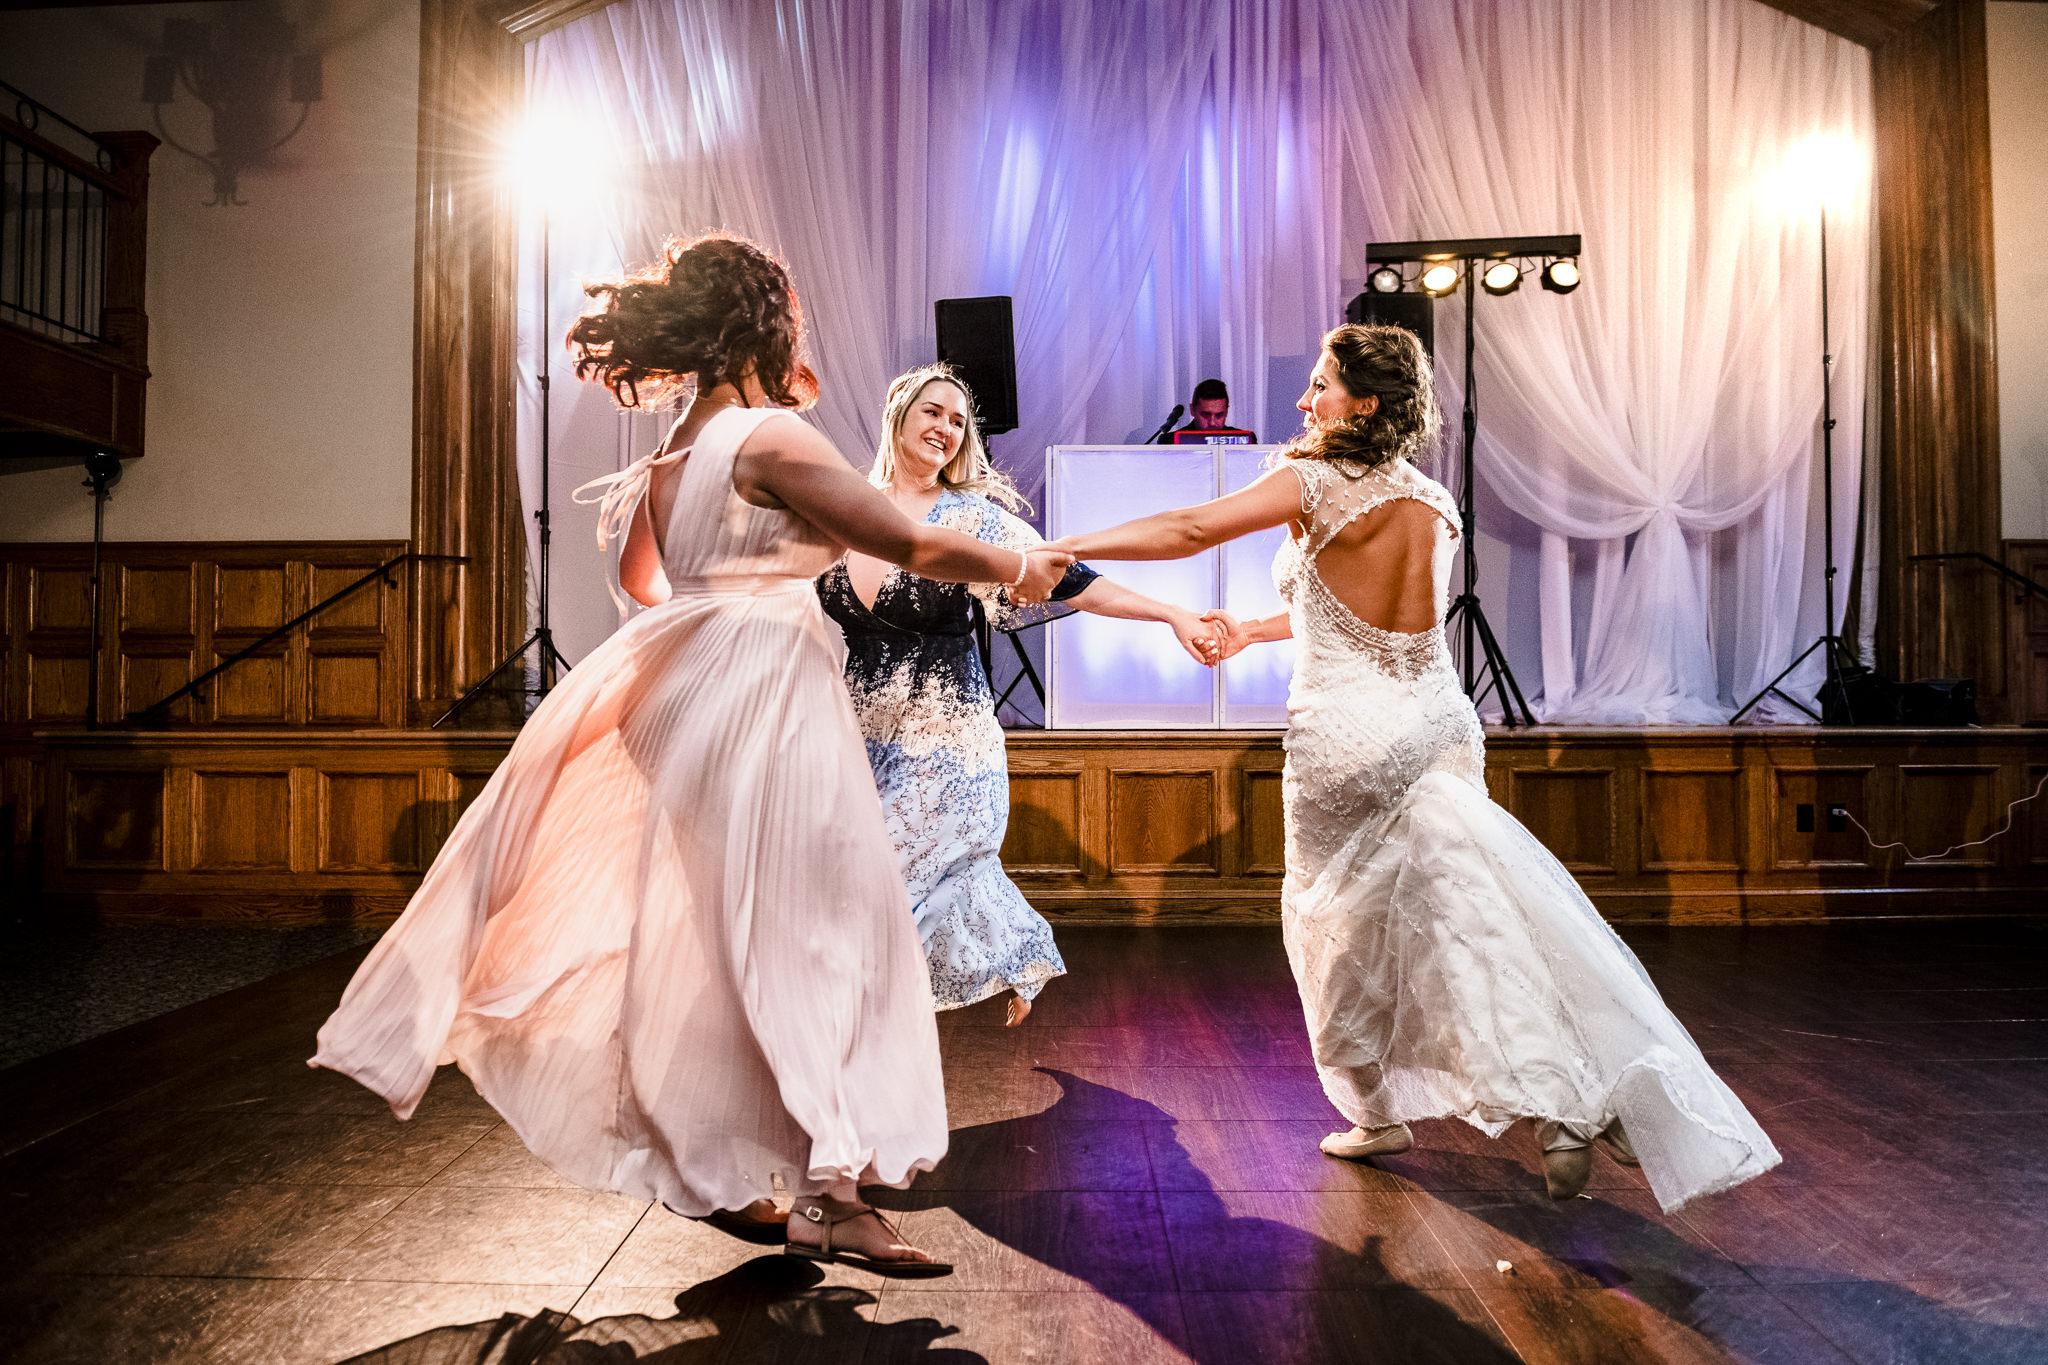 Barbato-Moorestown-Community-House-Wedding-New-Jersey-Photographer-38.JPG